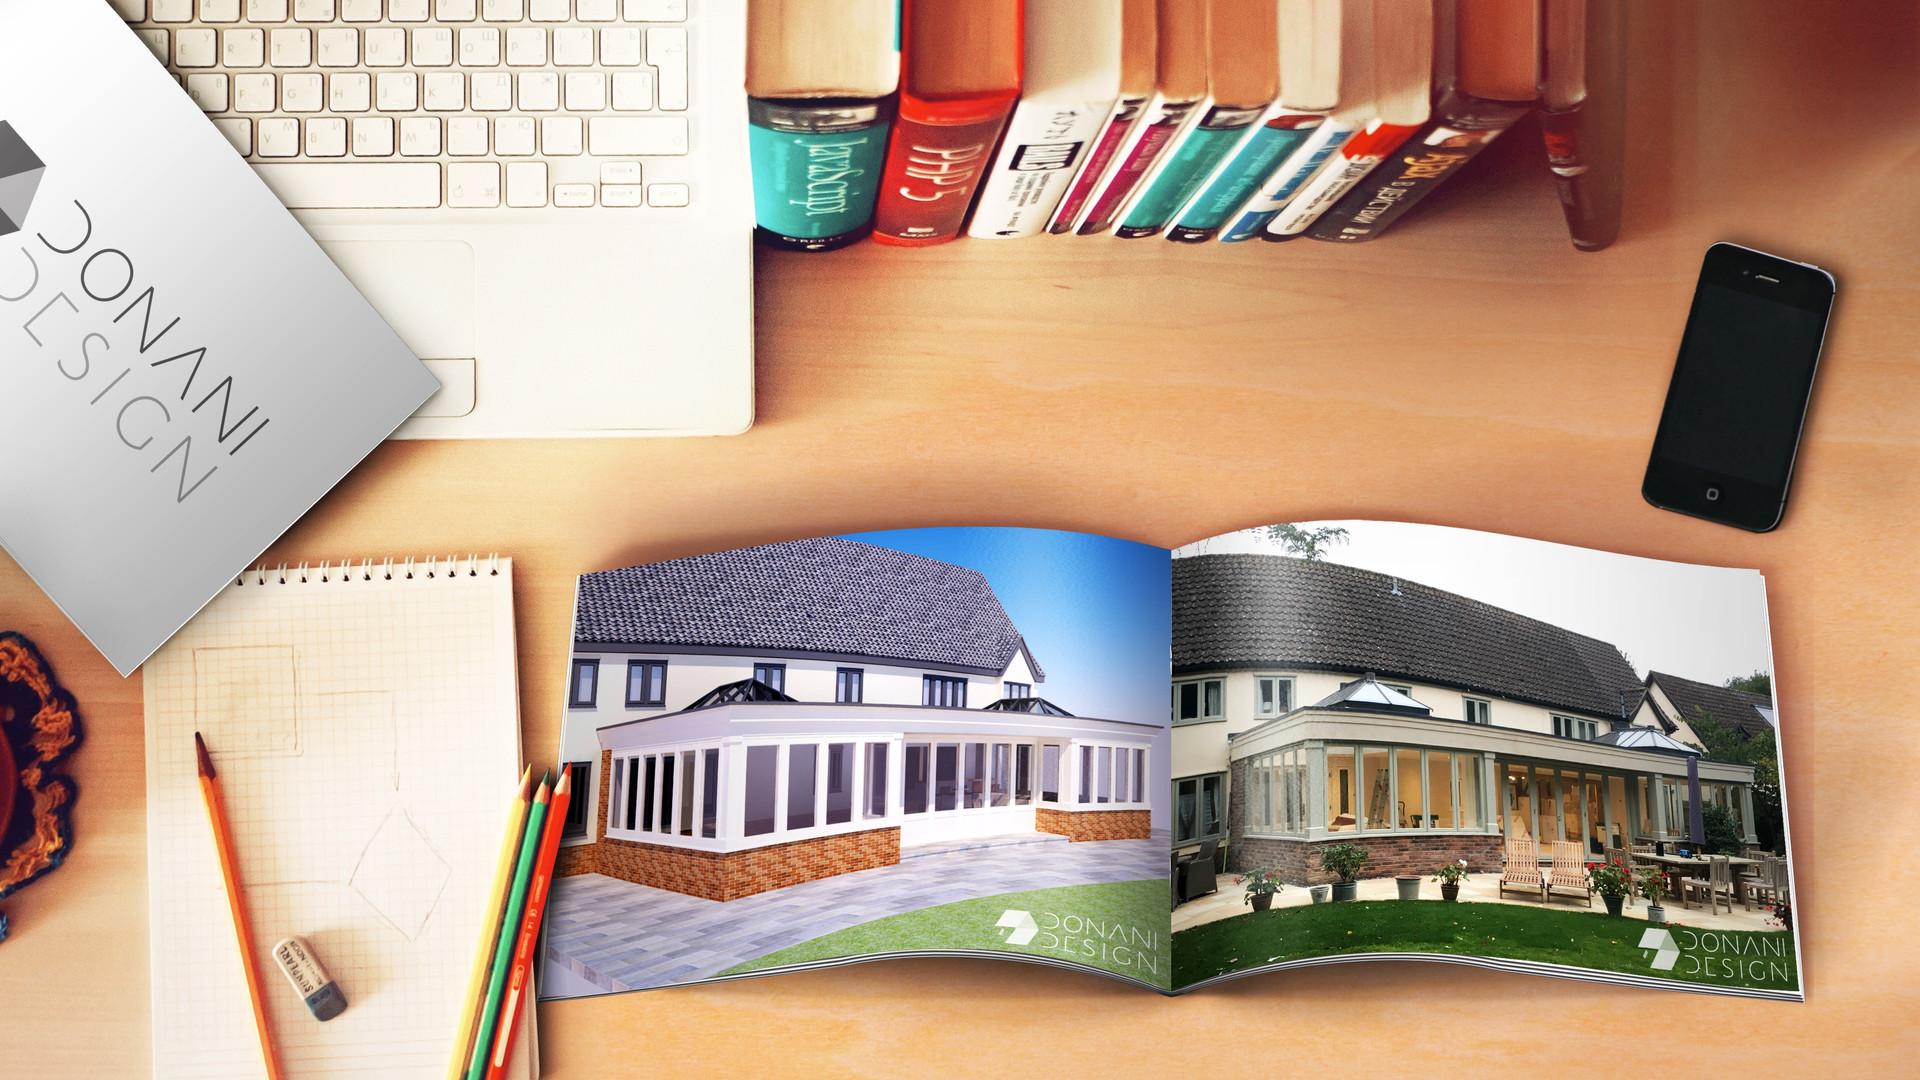 Donani Brochure